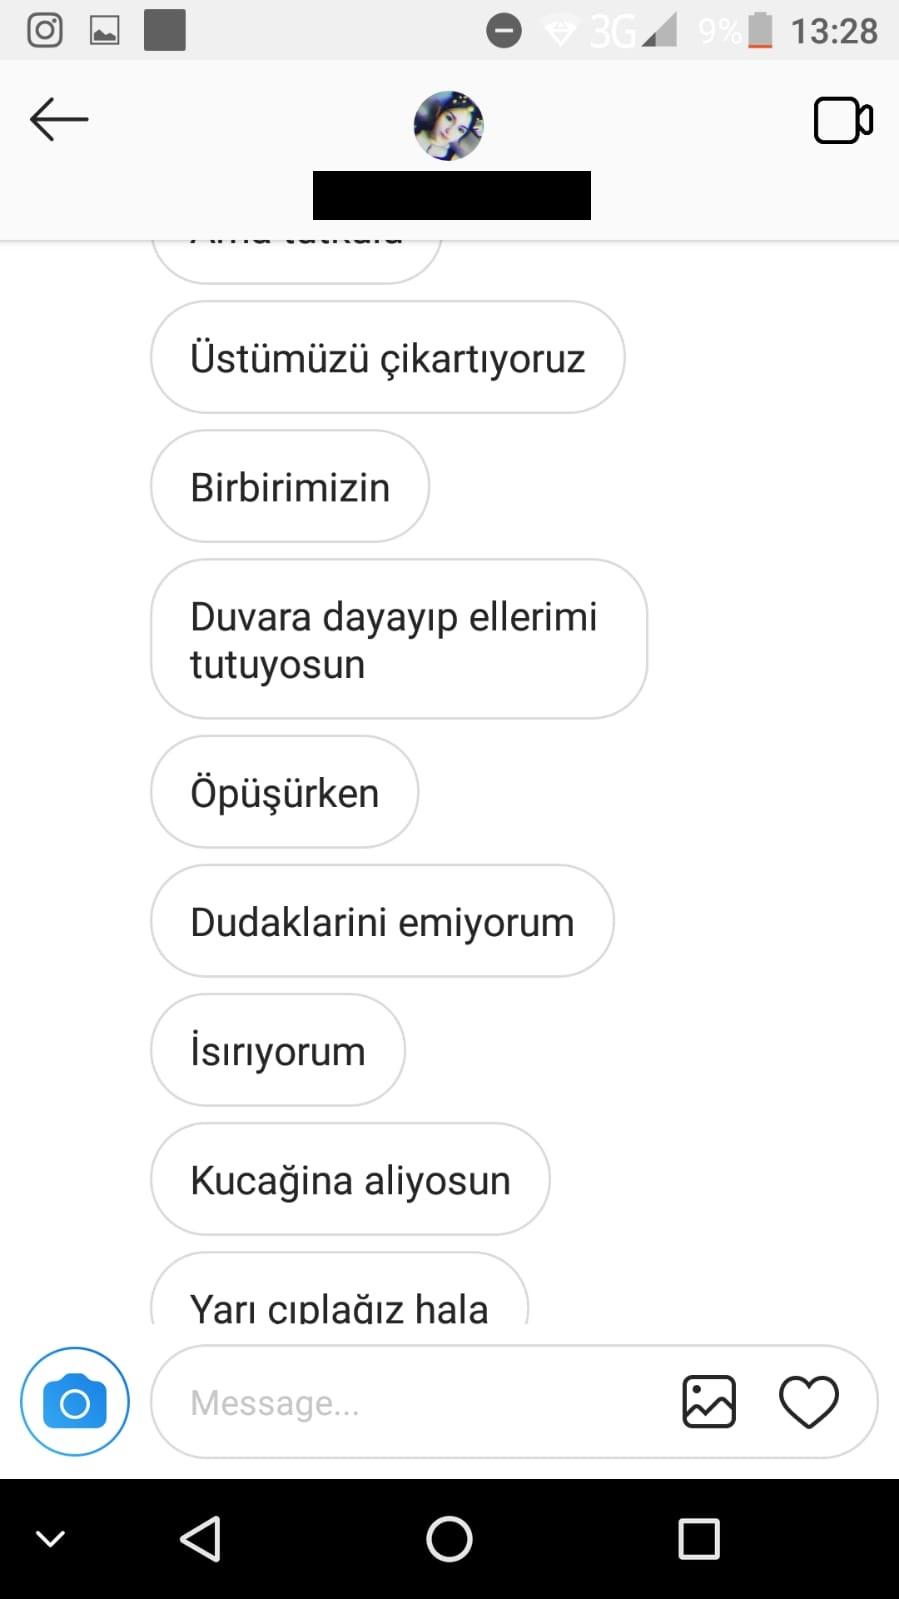 Türk Gençleri Snapchatte